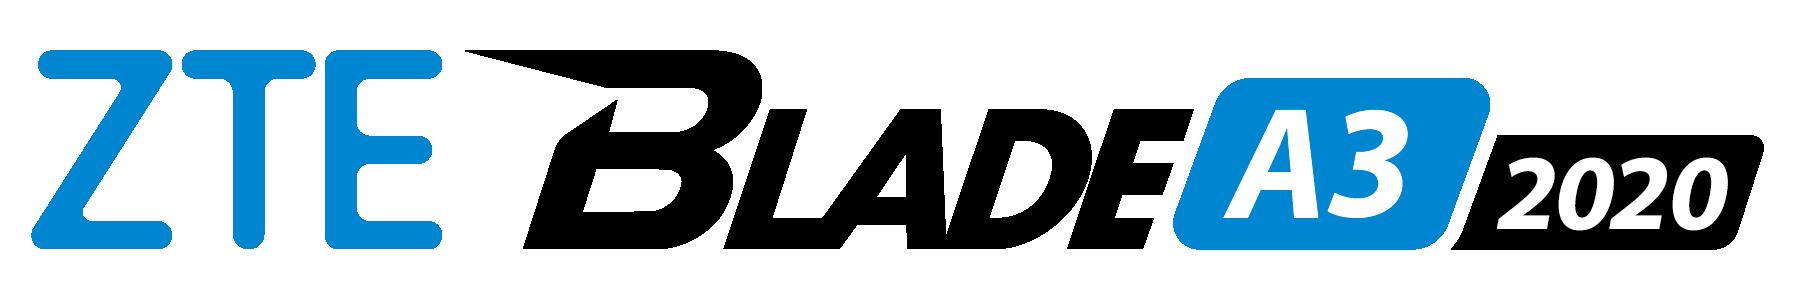 A3 2020